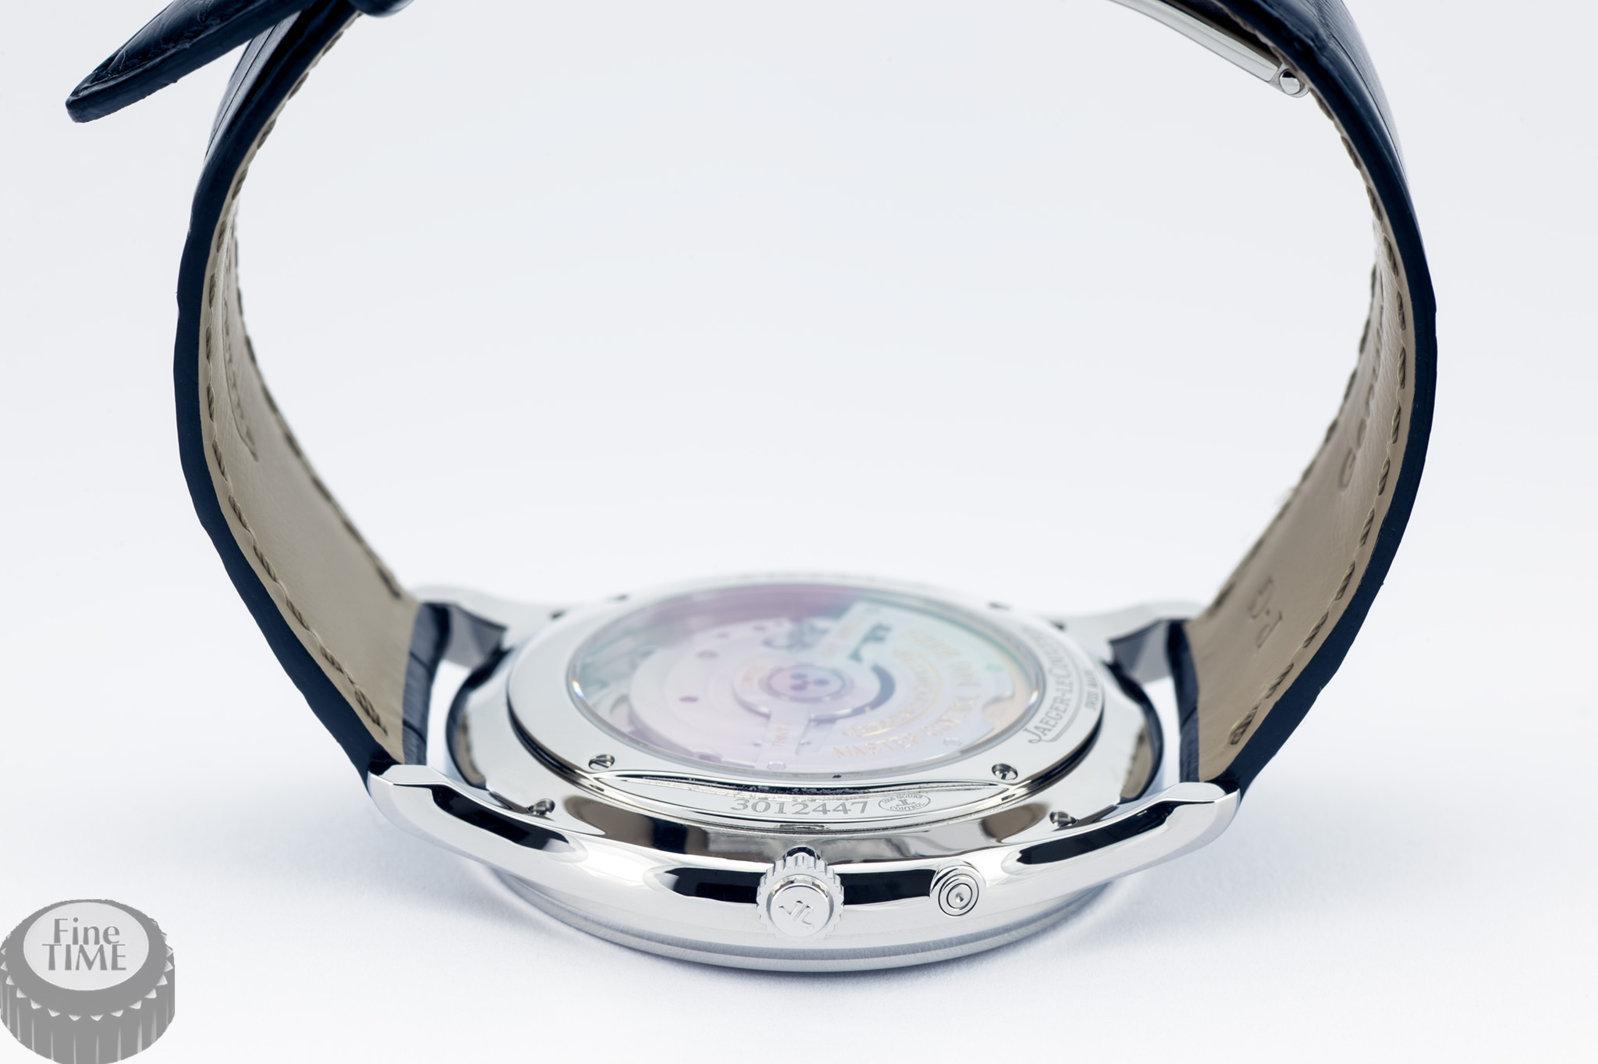 jaeger-lecoultre-master-ultra-thin-moon-39-1368420-05.jpg